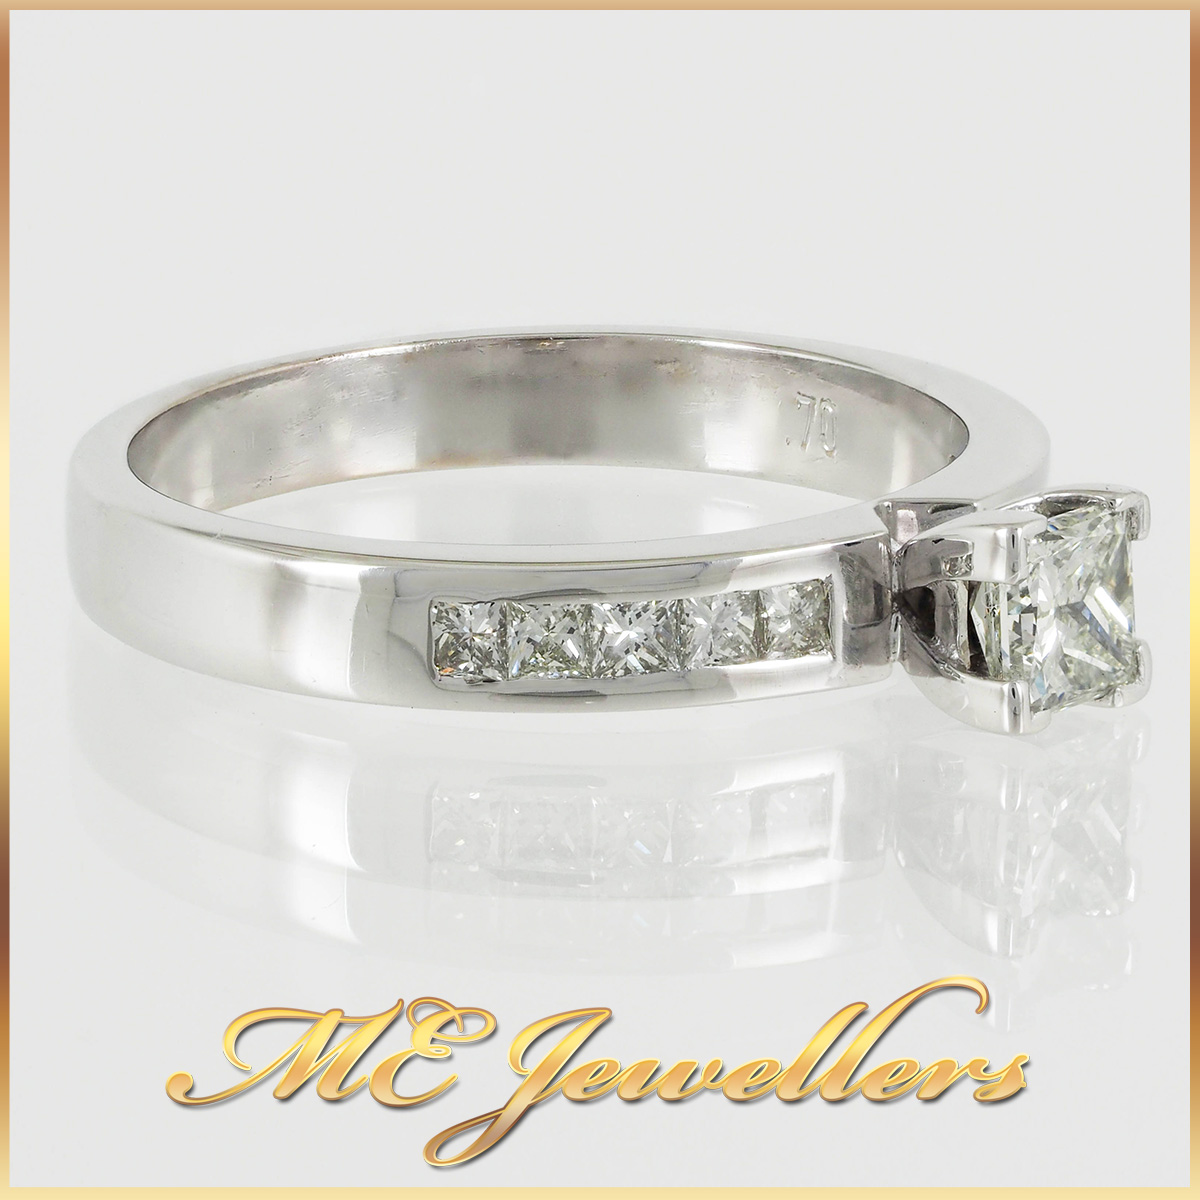 Petite 4 Prong 18k White Gold Diamond Ring